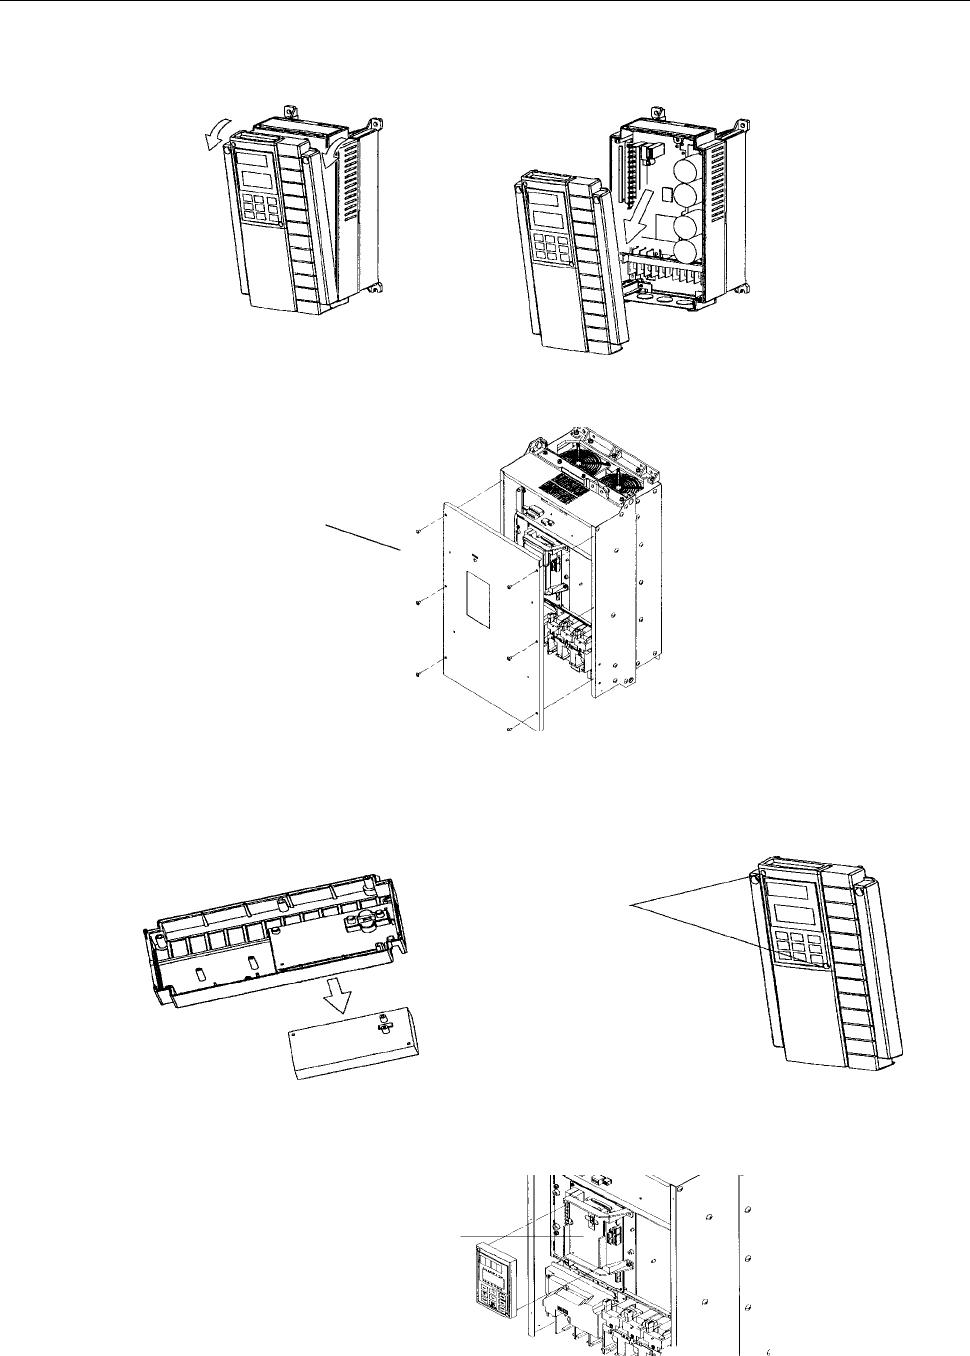 GEI 100363 Fuji AF300 G11 Manual